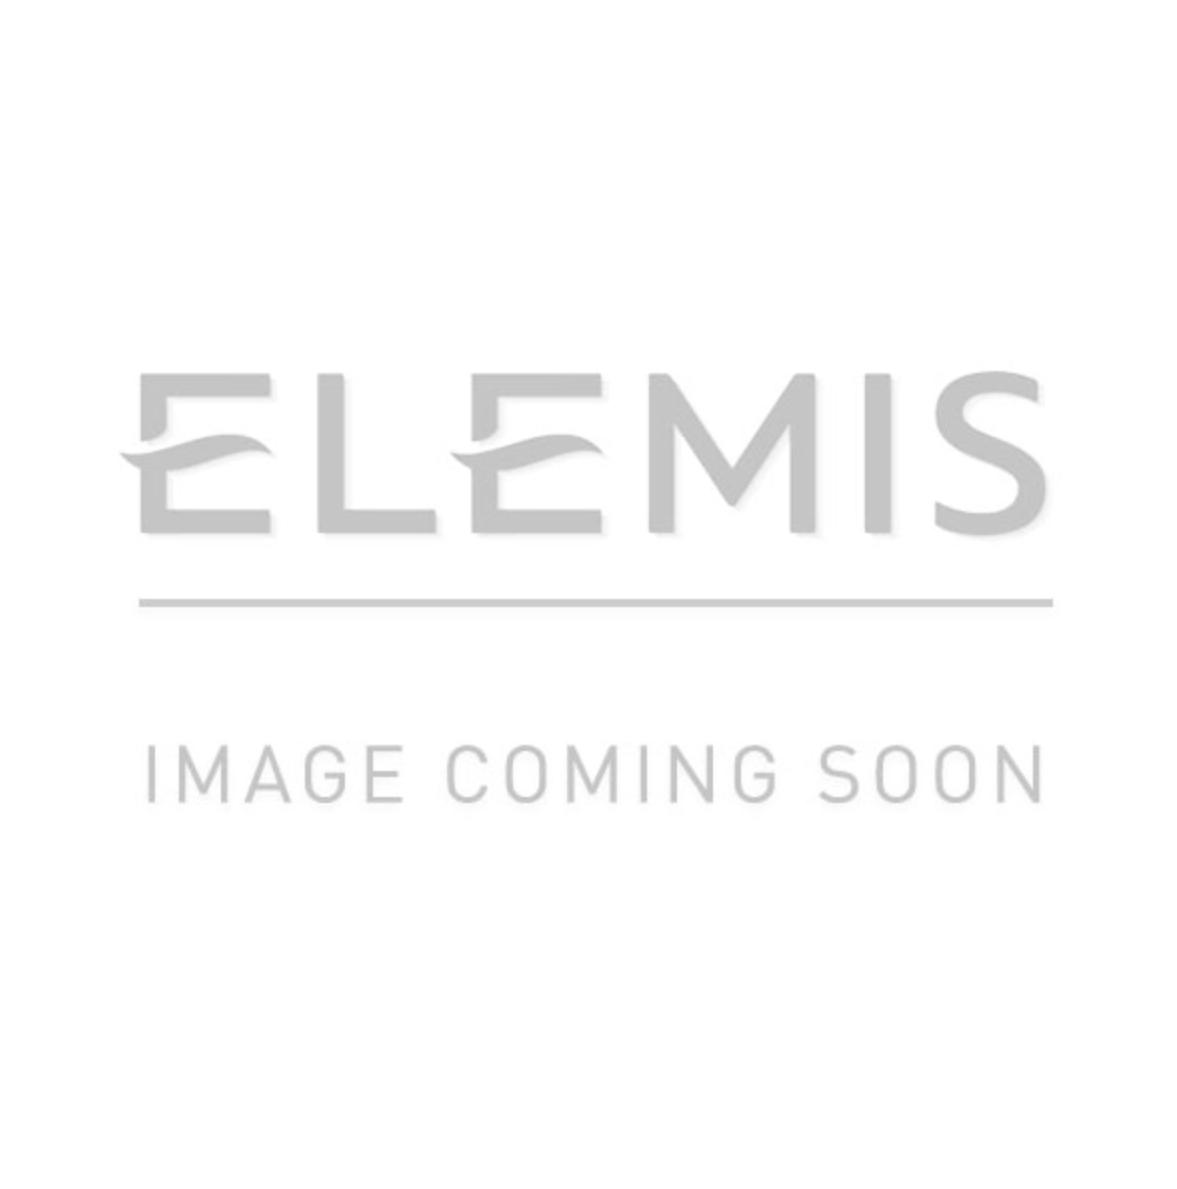 ELEMIS Christmas Gift Sets 2018 | Xmas Presents & Gifts ...